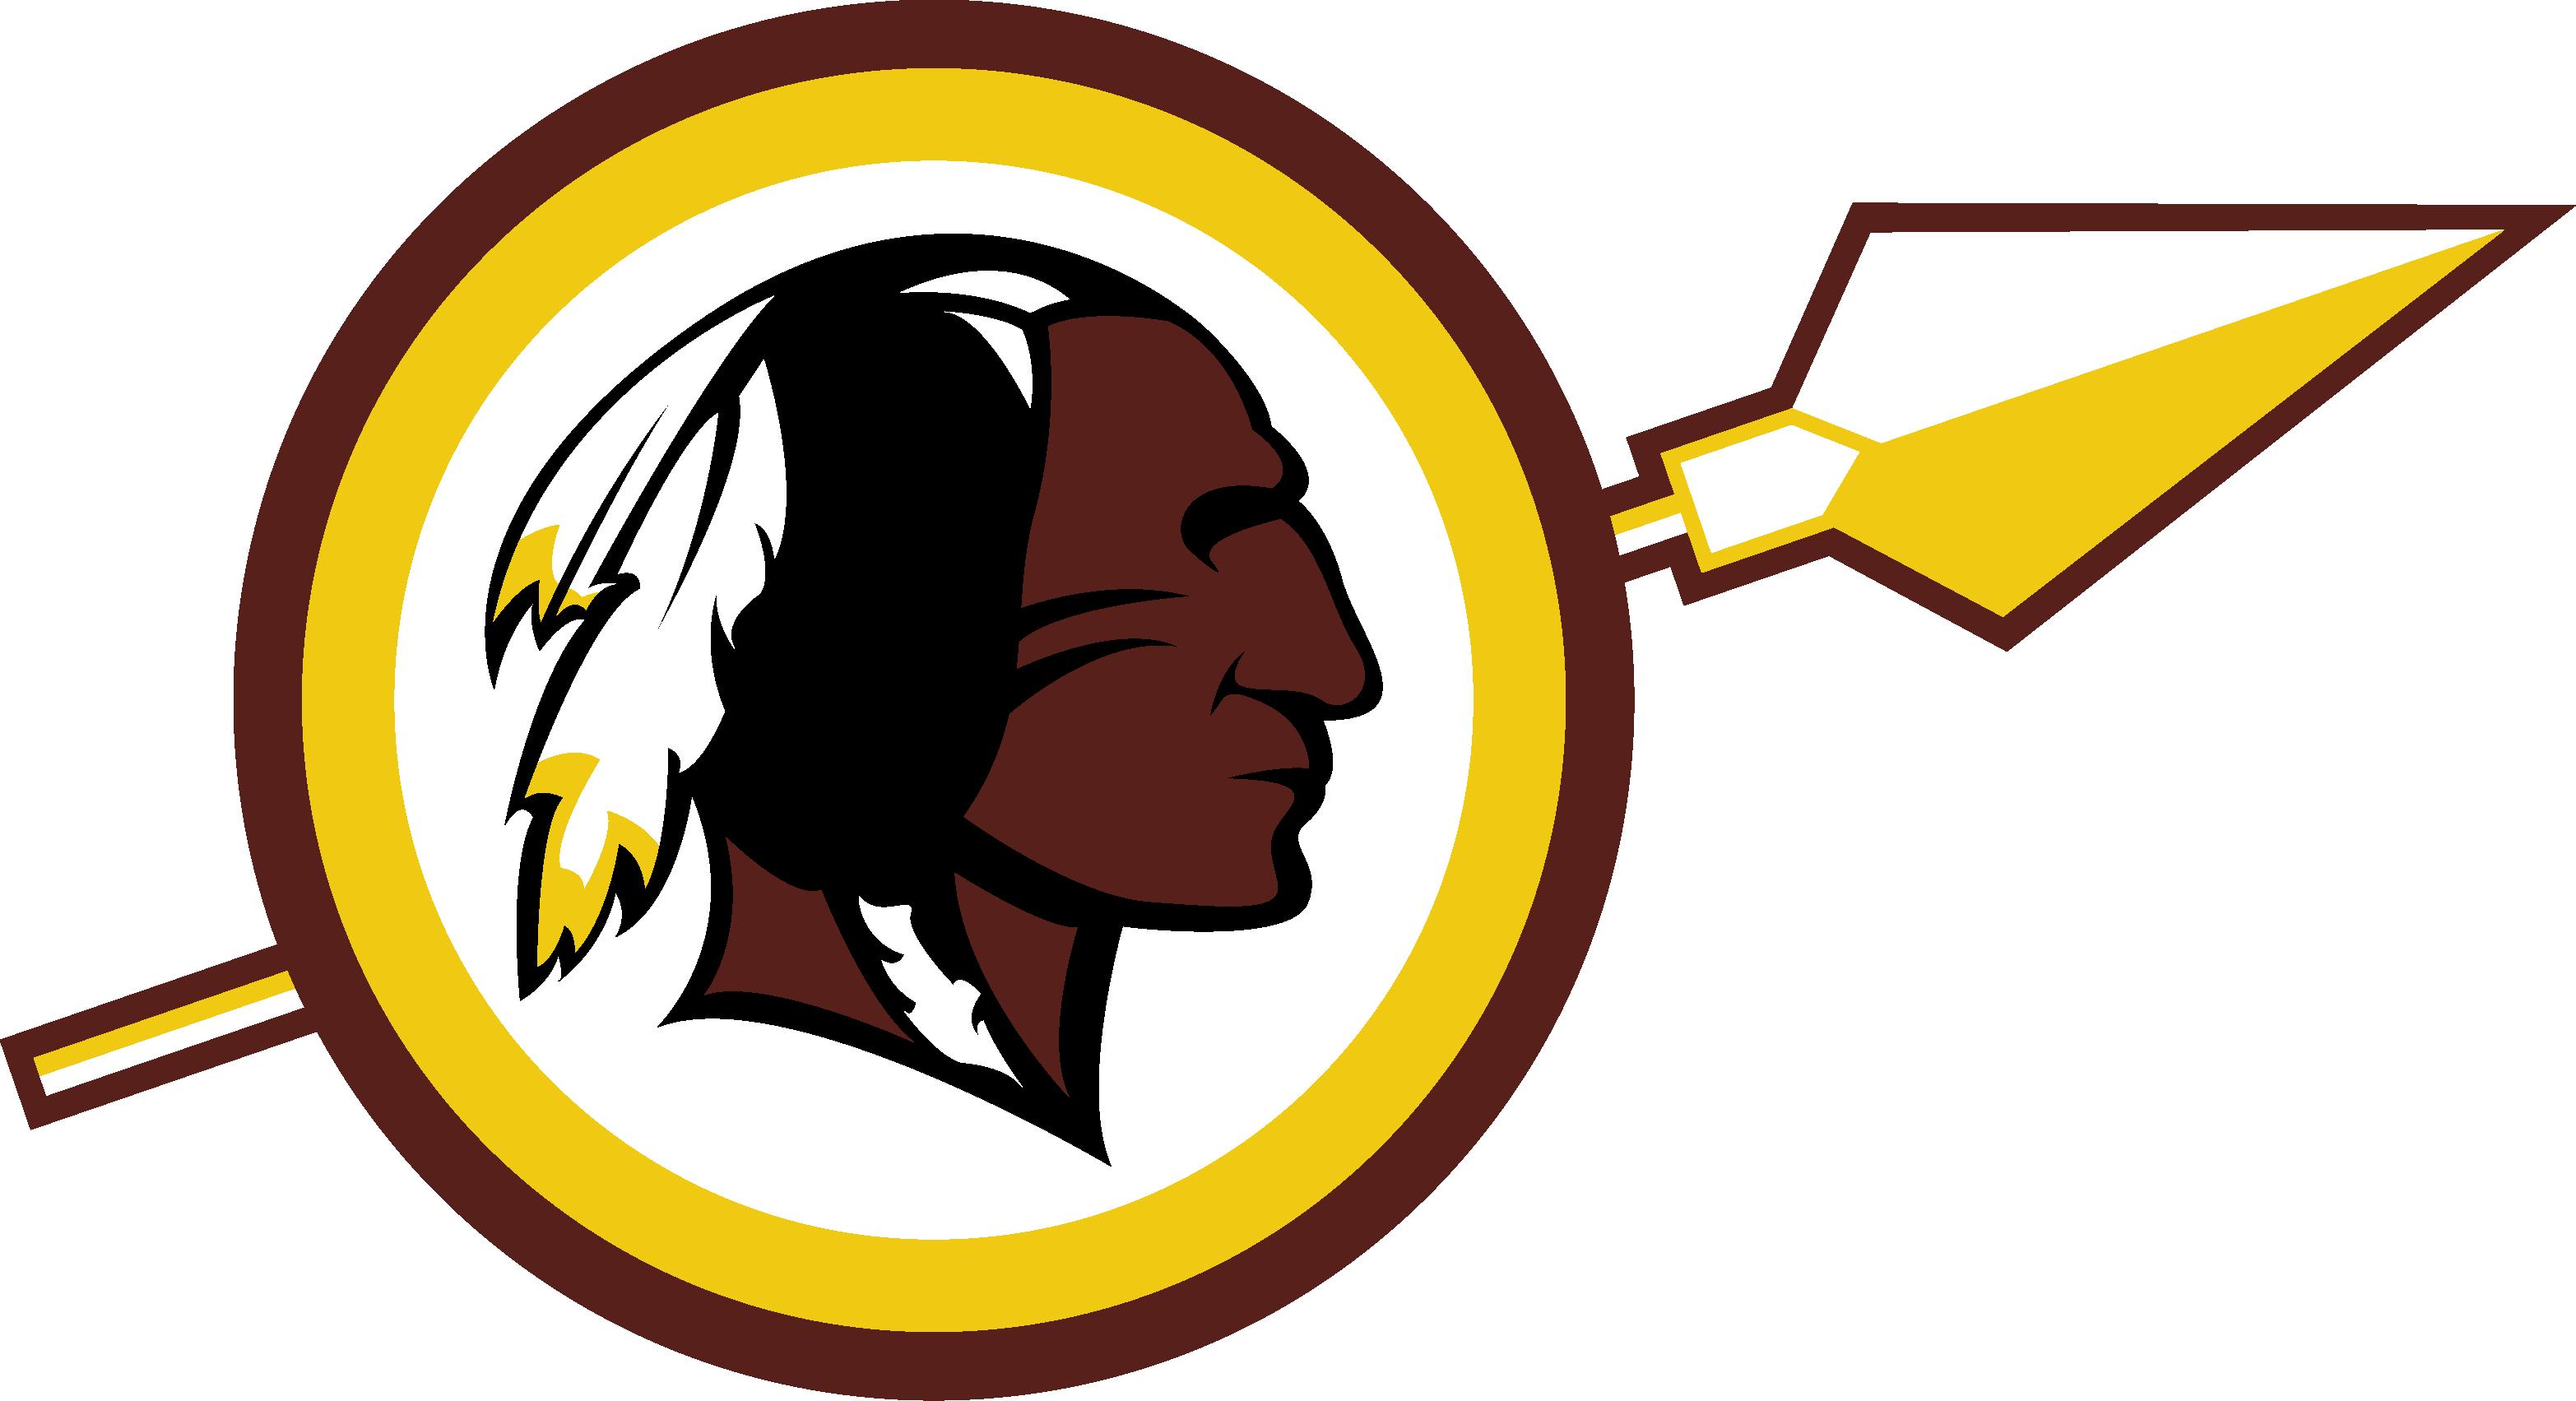 Washington Redskins-Washington Redskins-12